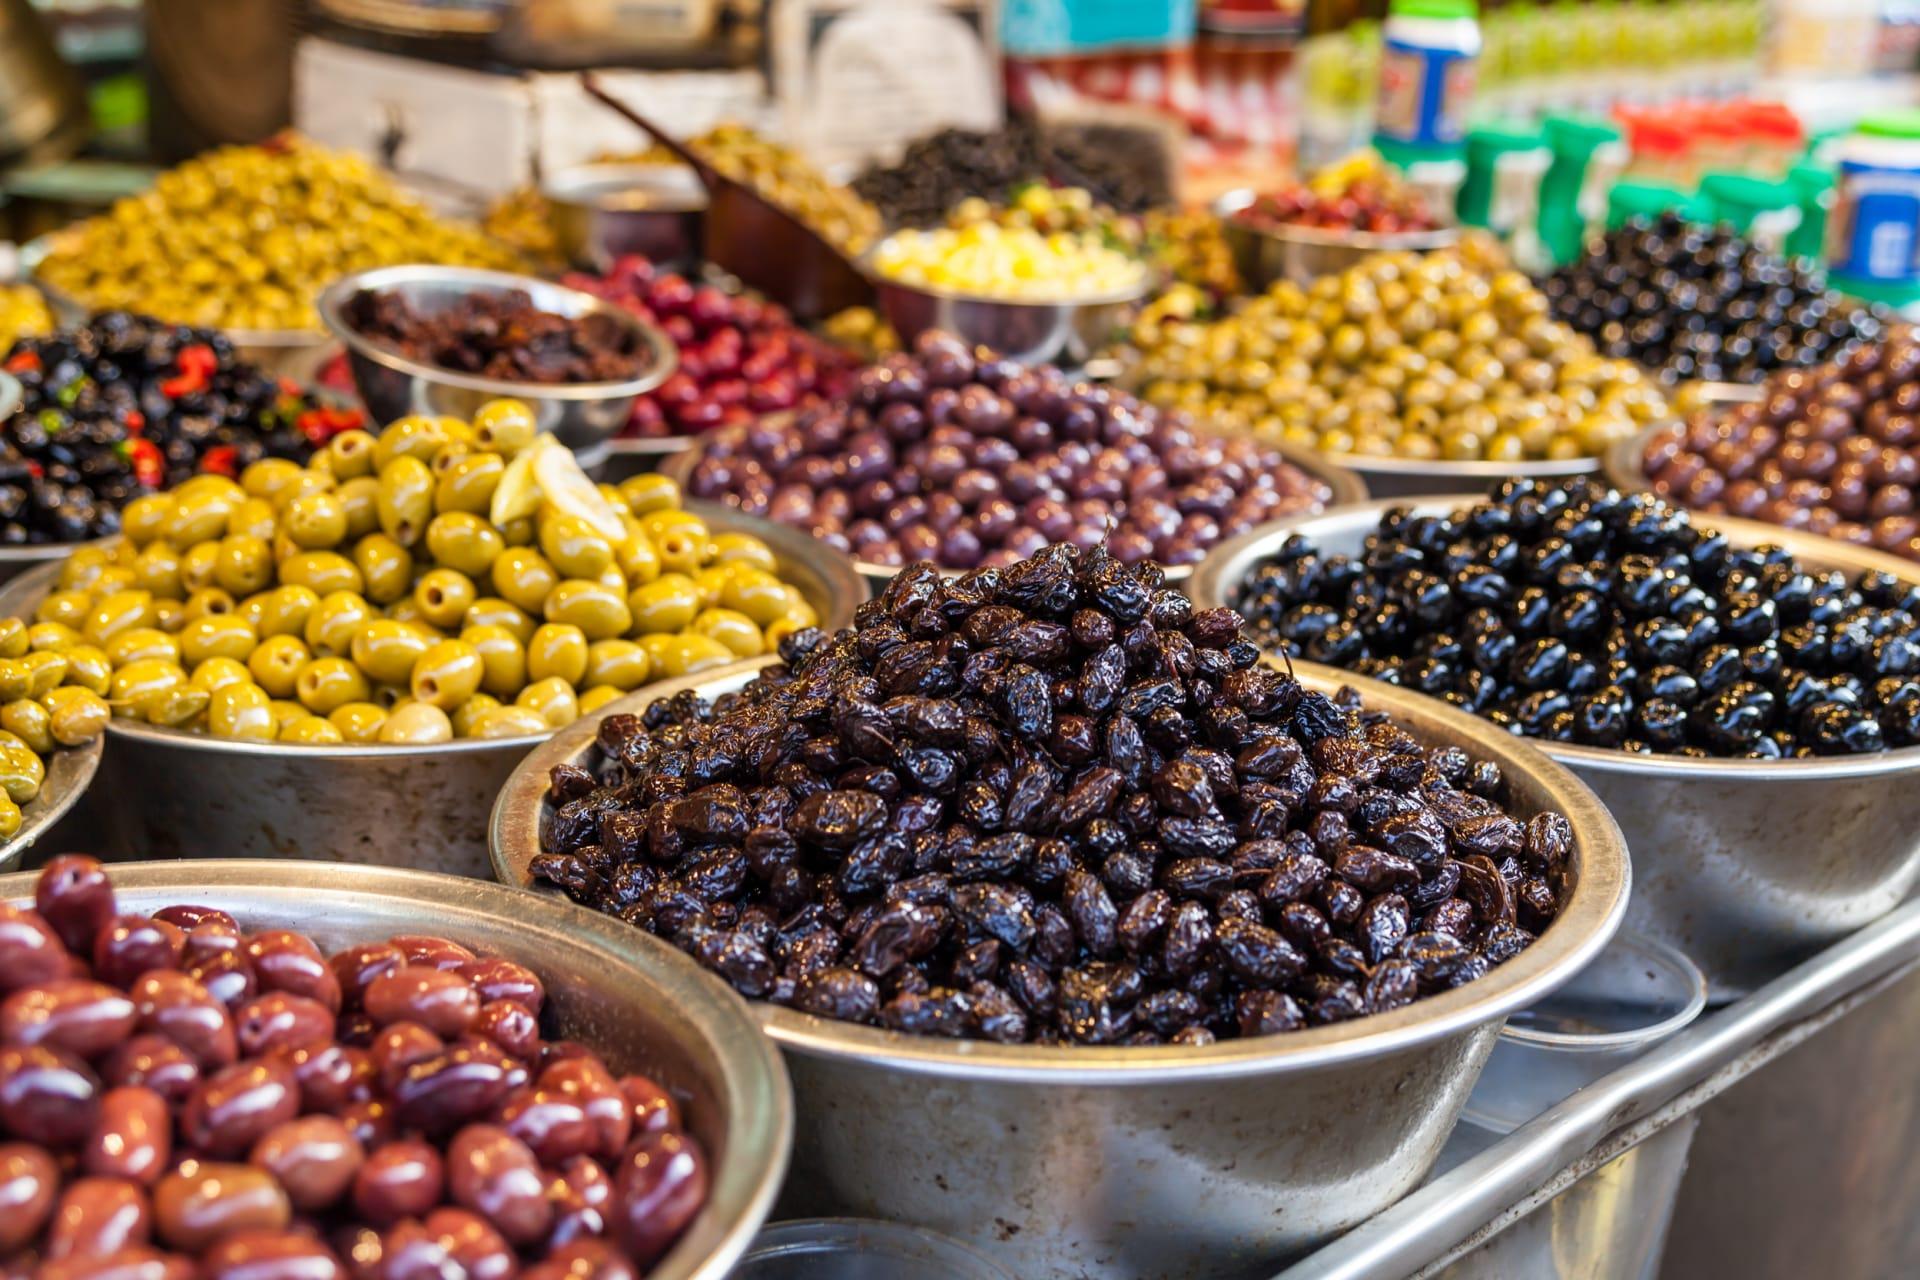 Tel Aviv - Special: Jewish New Year's Visit to Carmel Market